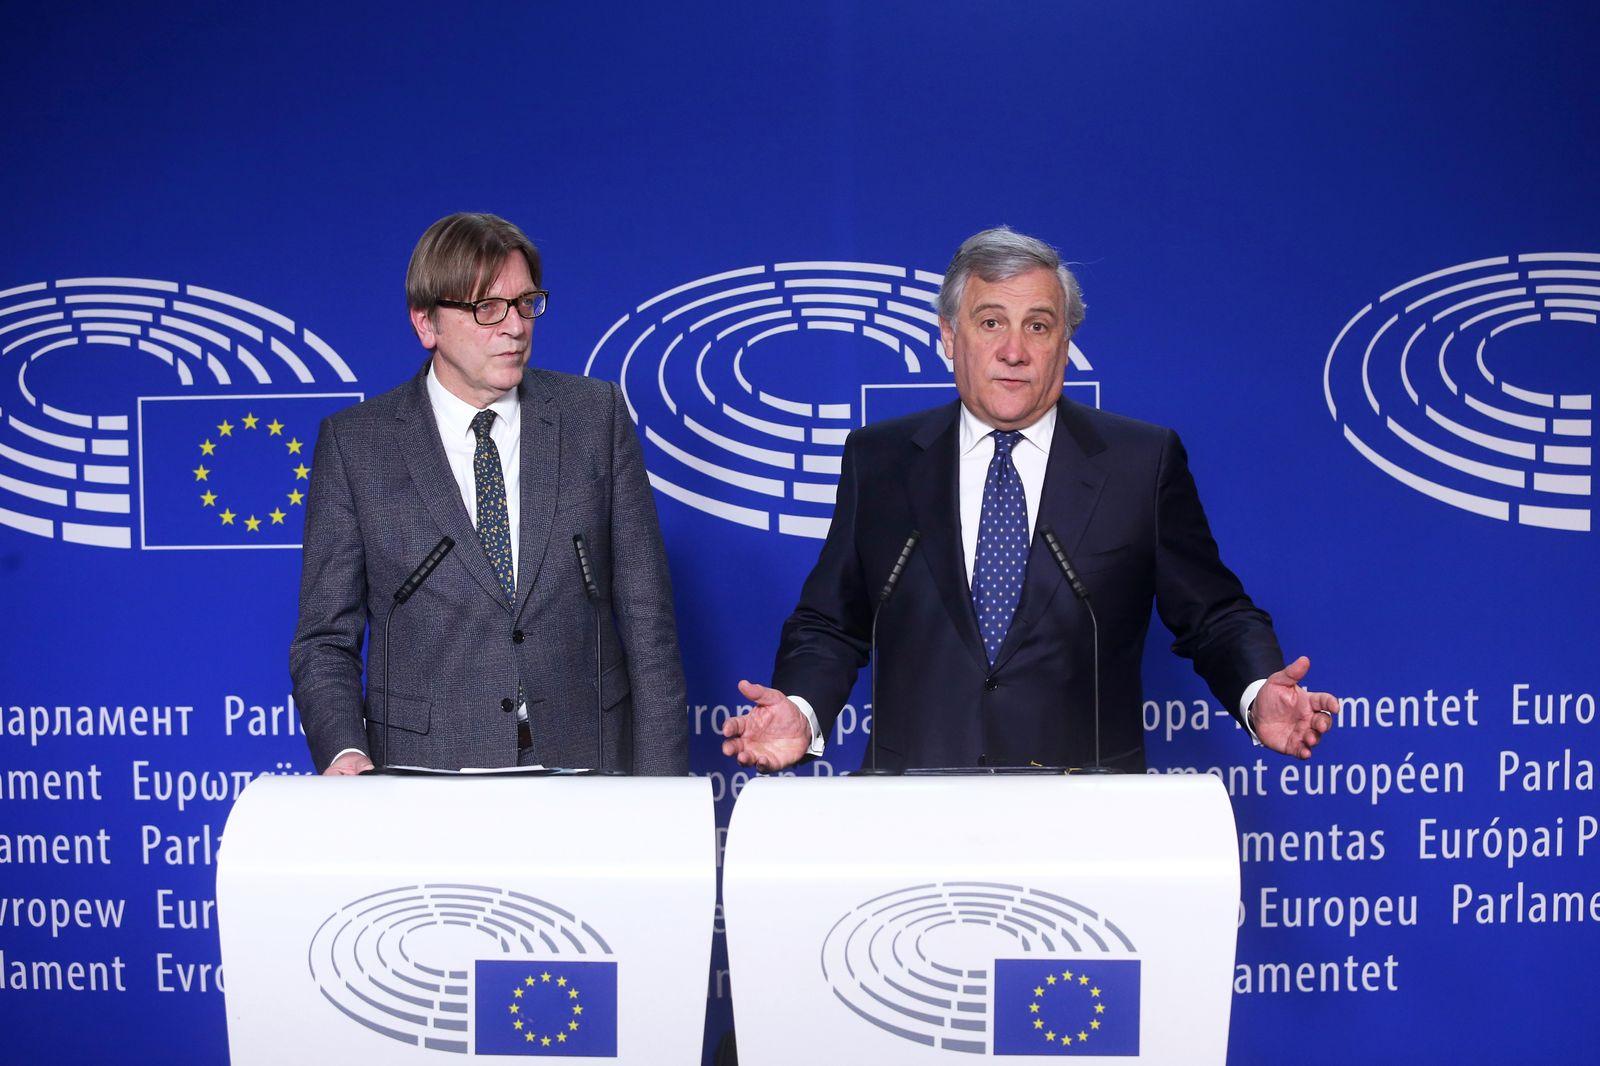 Antonio Tajani/ Guy Verhofstadt